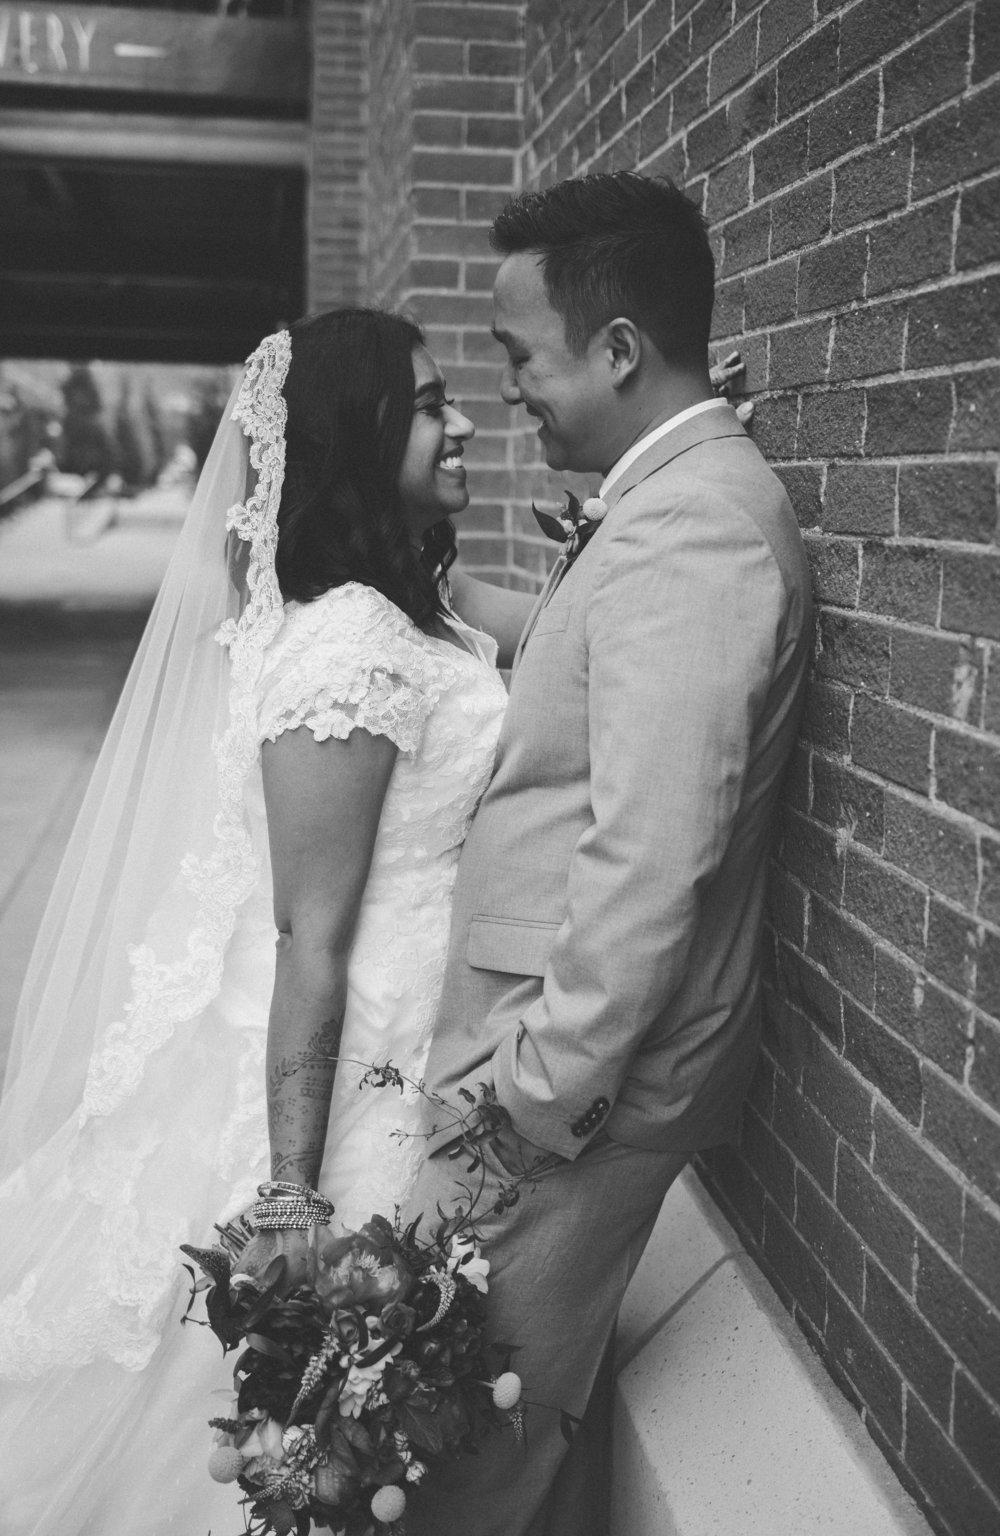 RnP+Lim+Wedding+(163)-2.jpg